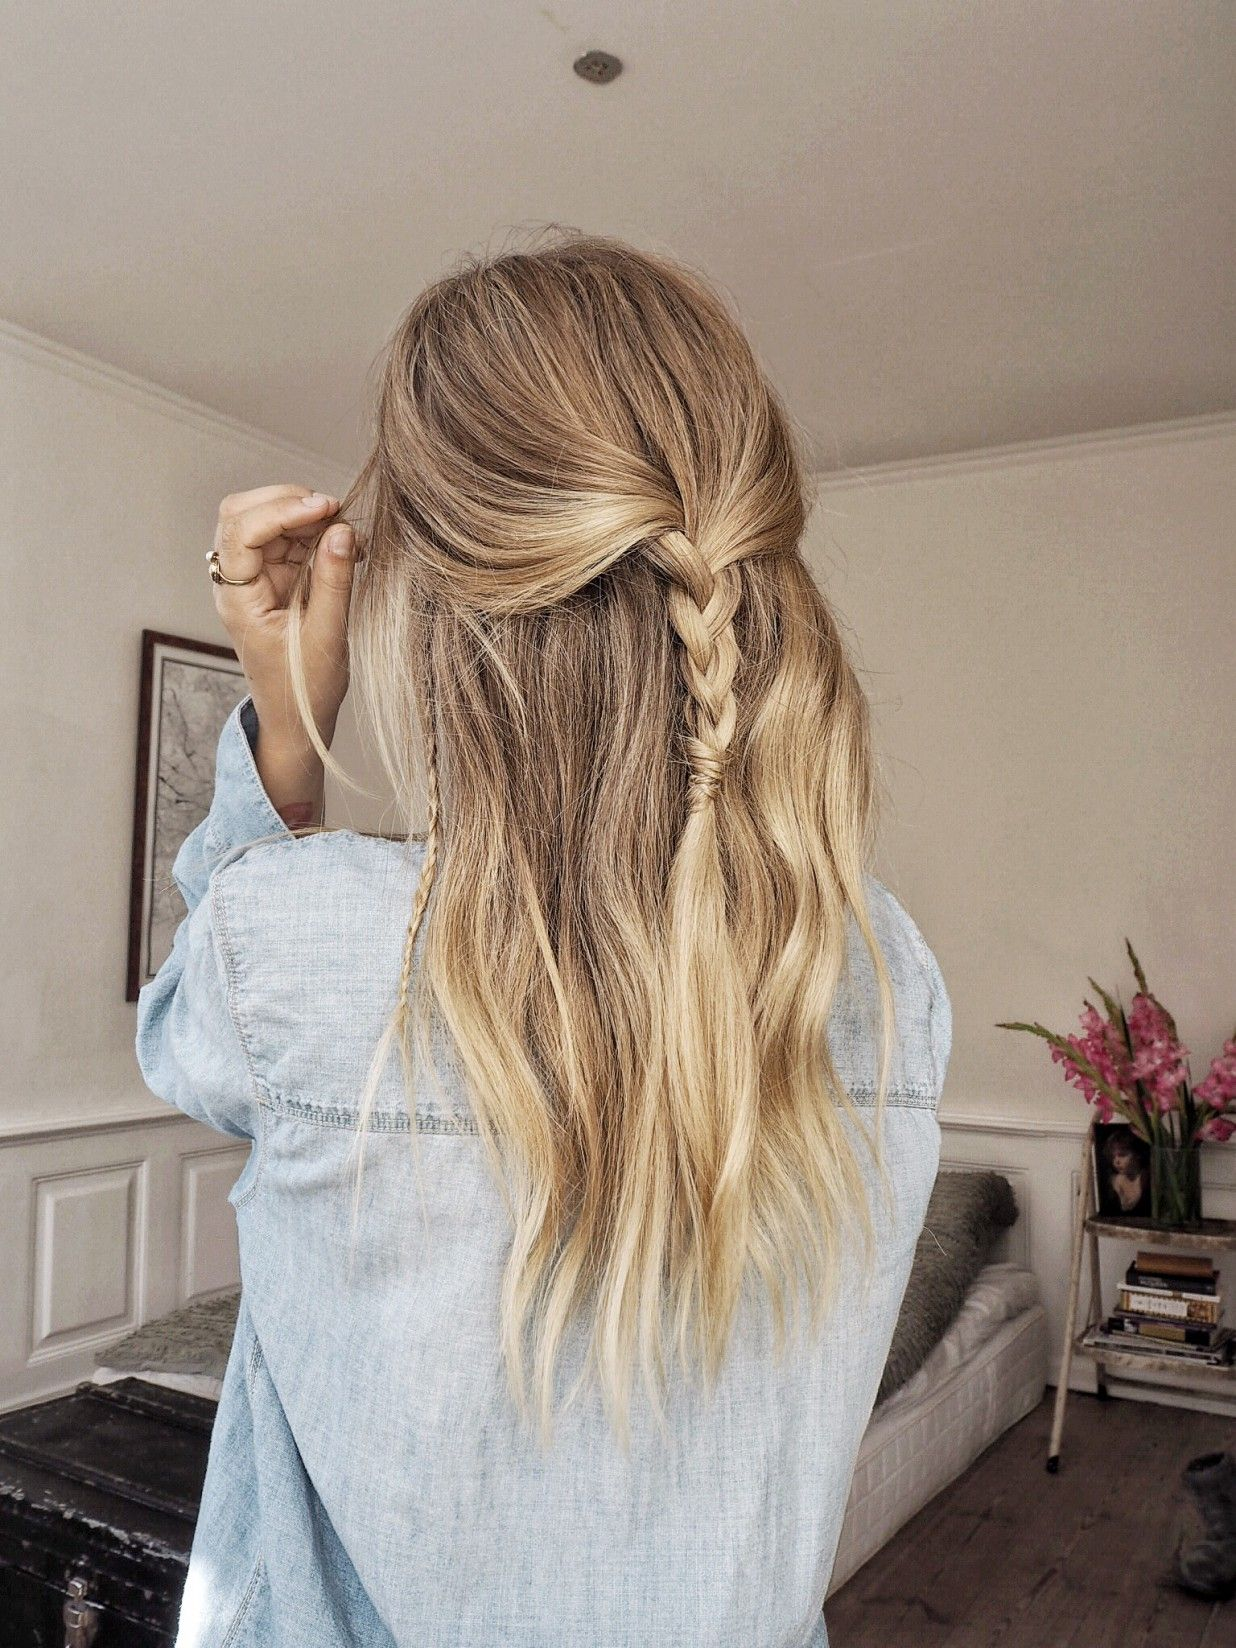 Pin by sarahlhynne on hair inspo in pinterest hair hair